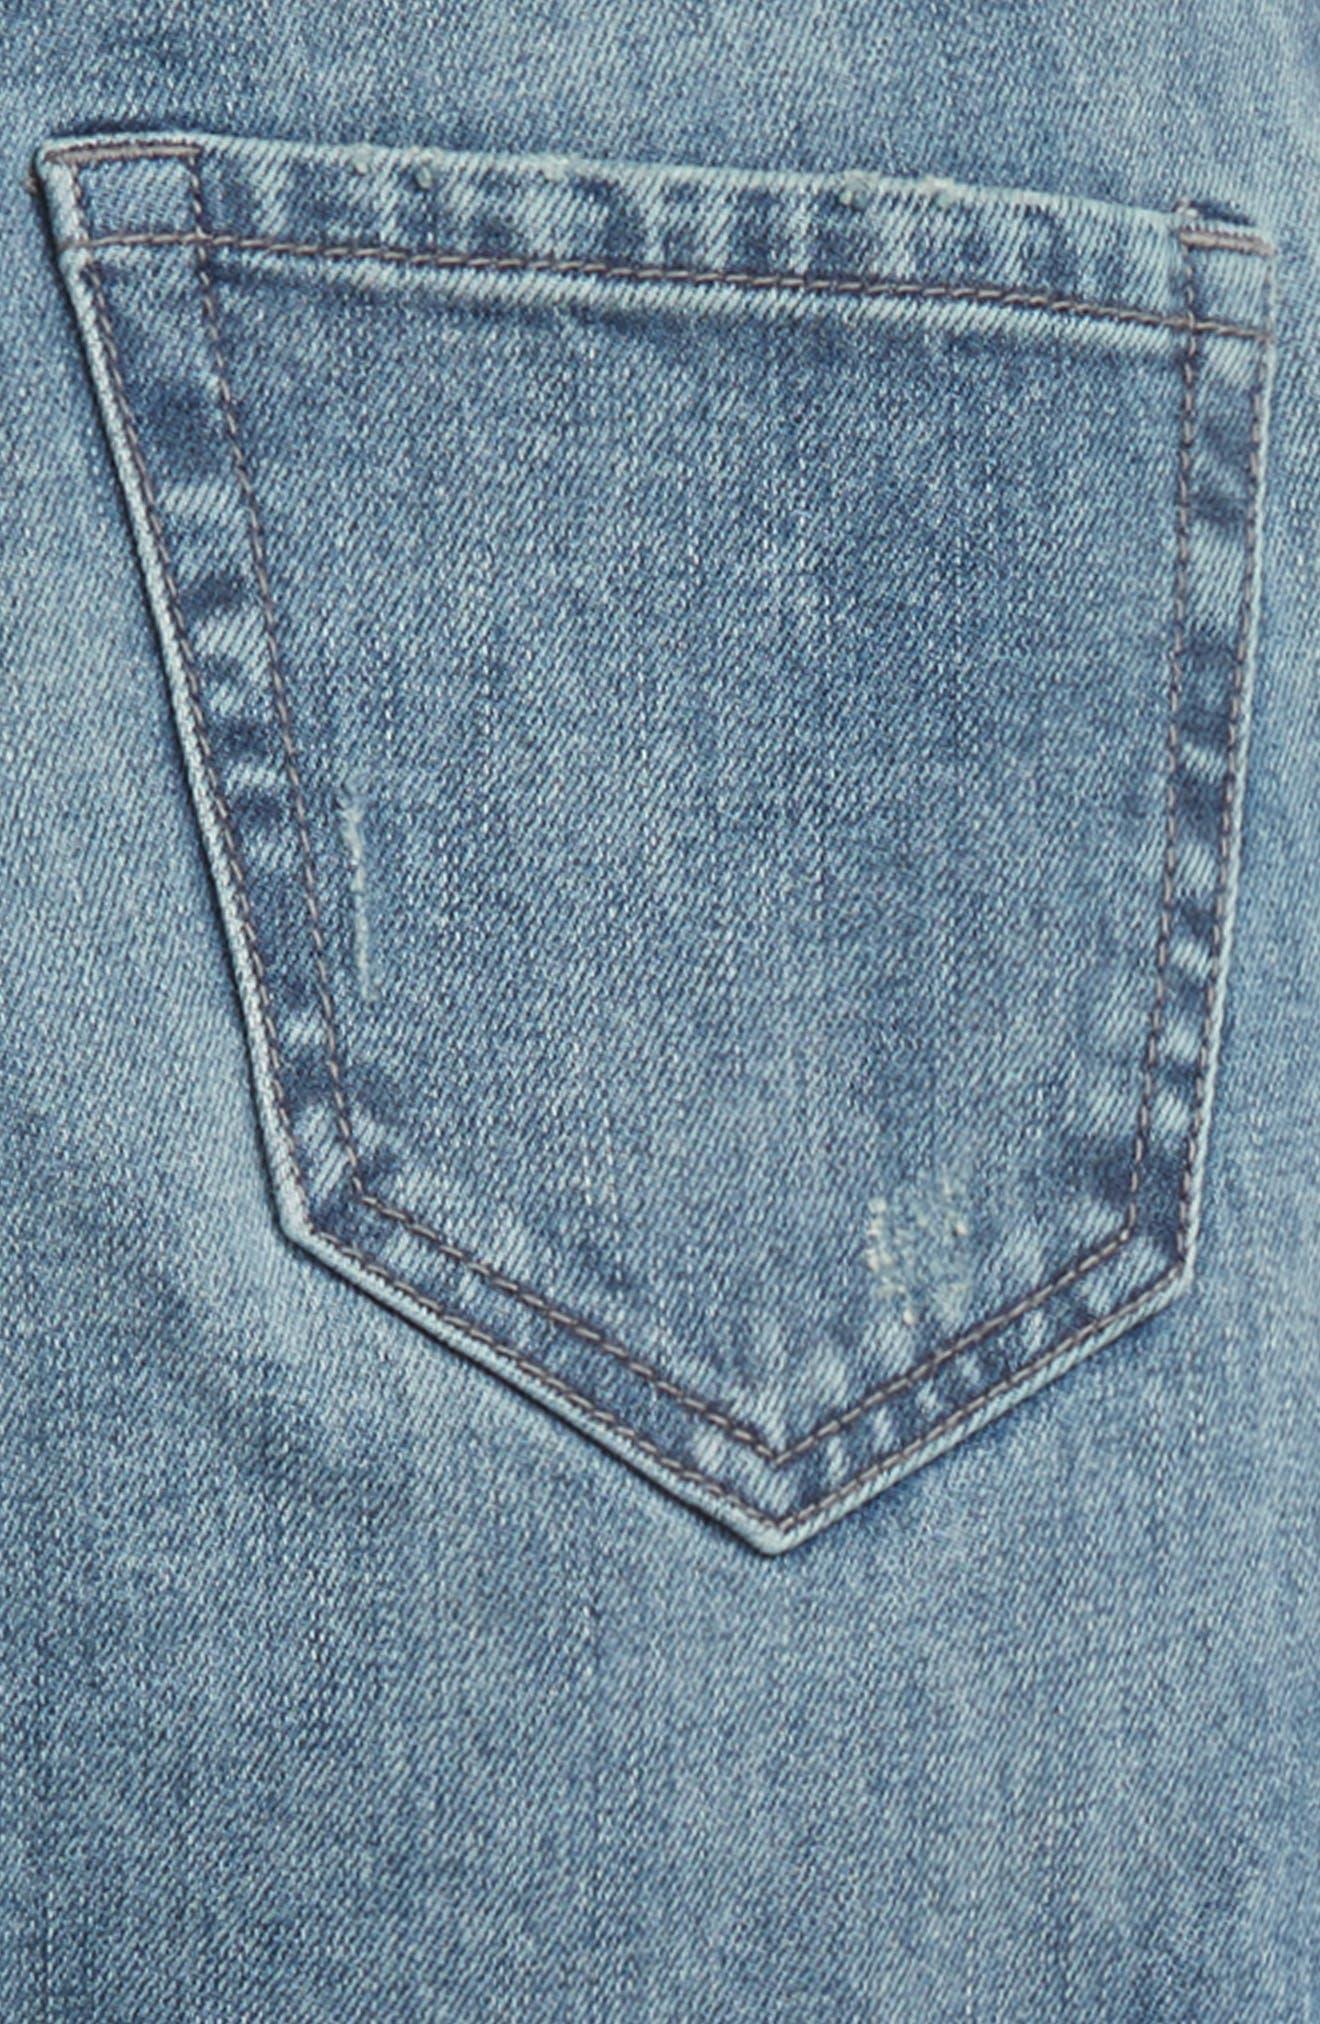 Treaure & Bond Light Wash Jeans,                             Alternate thumbnail 3, color,                             ACID FADE WASH